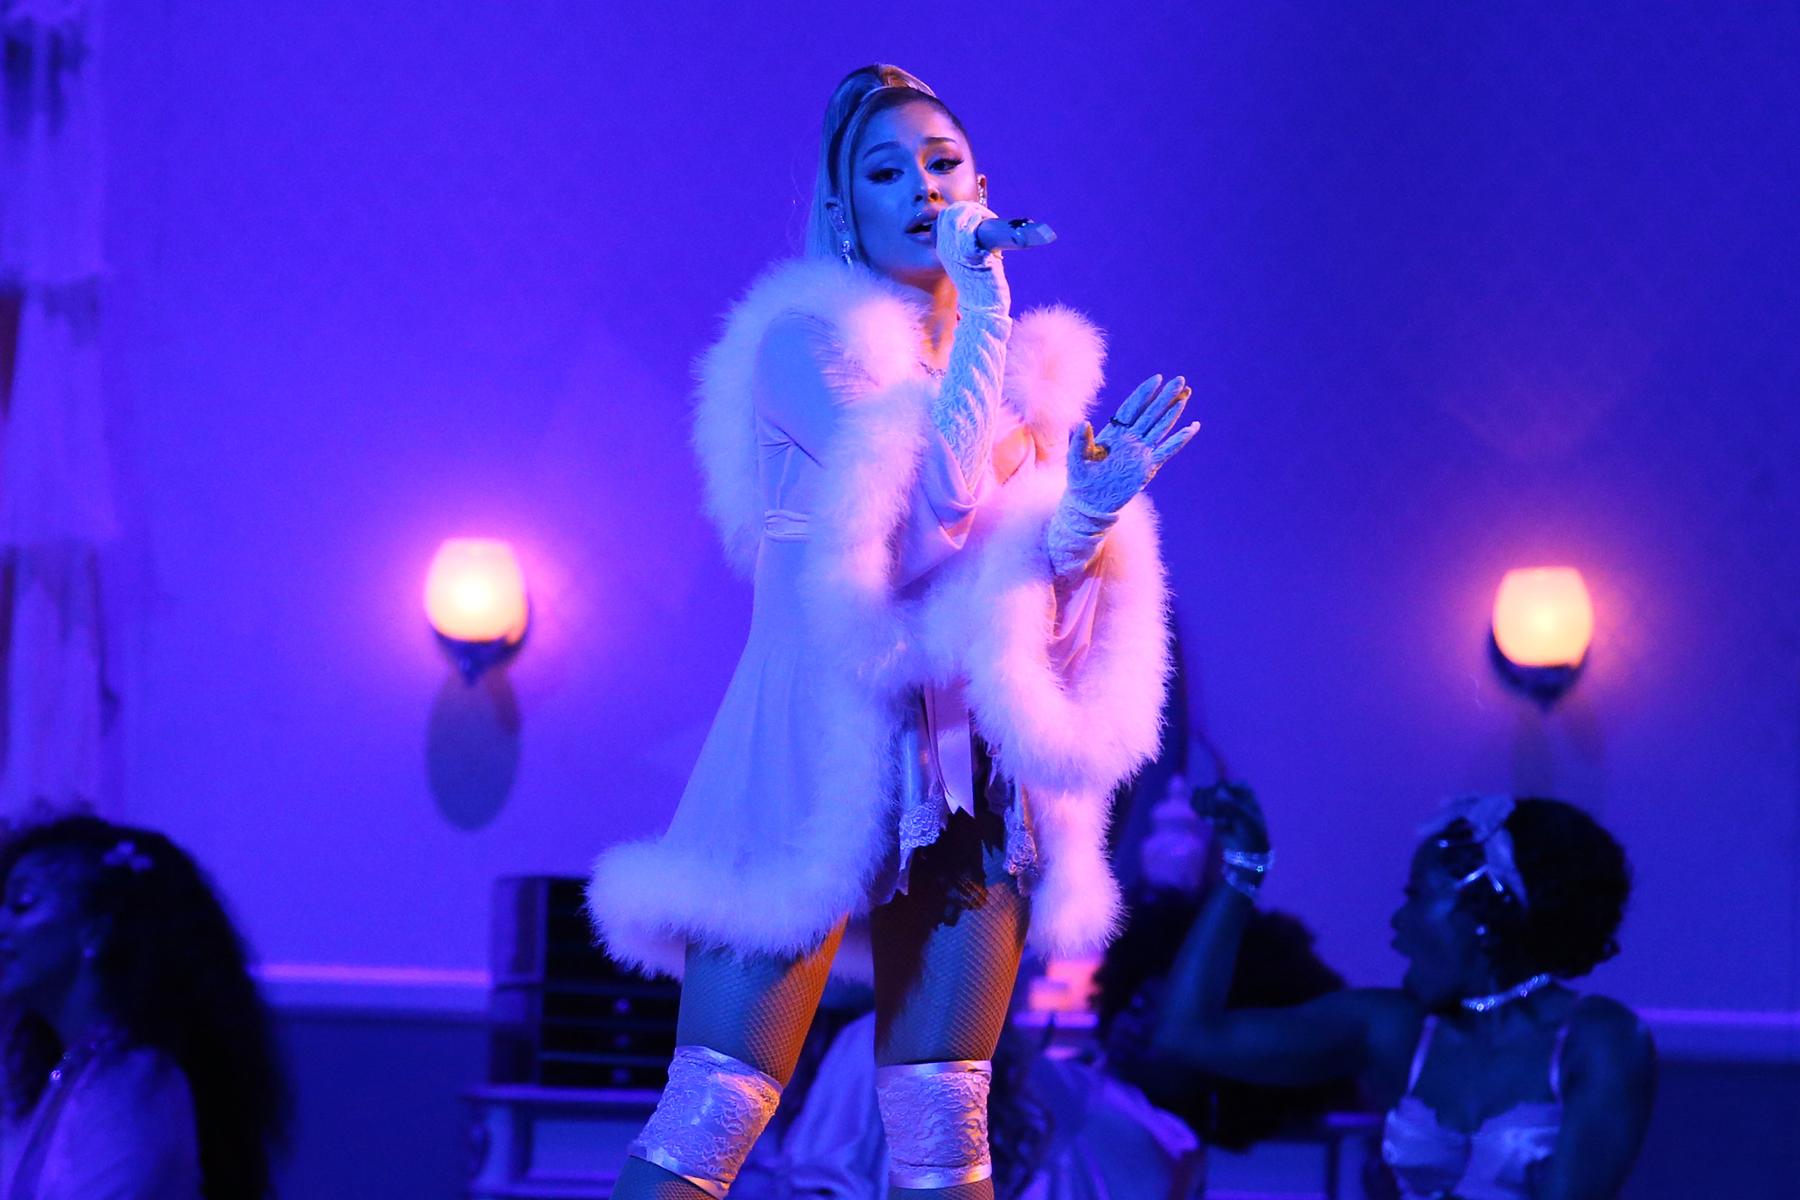 Ariana Grande Will Be a Coach on 'The Voice' Season 21